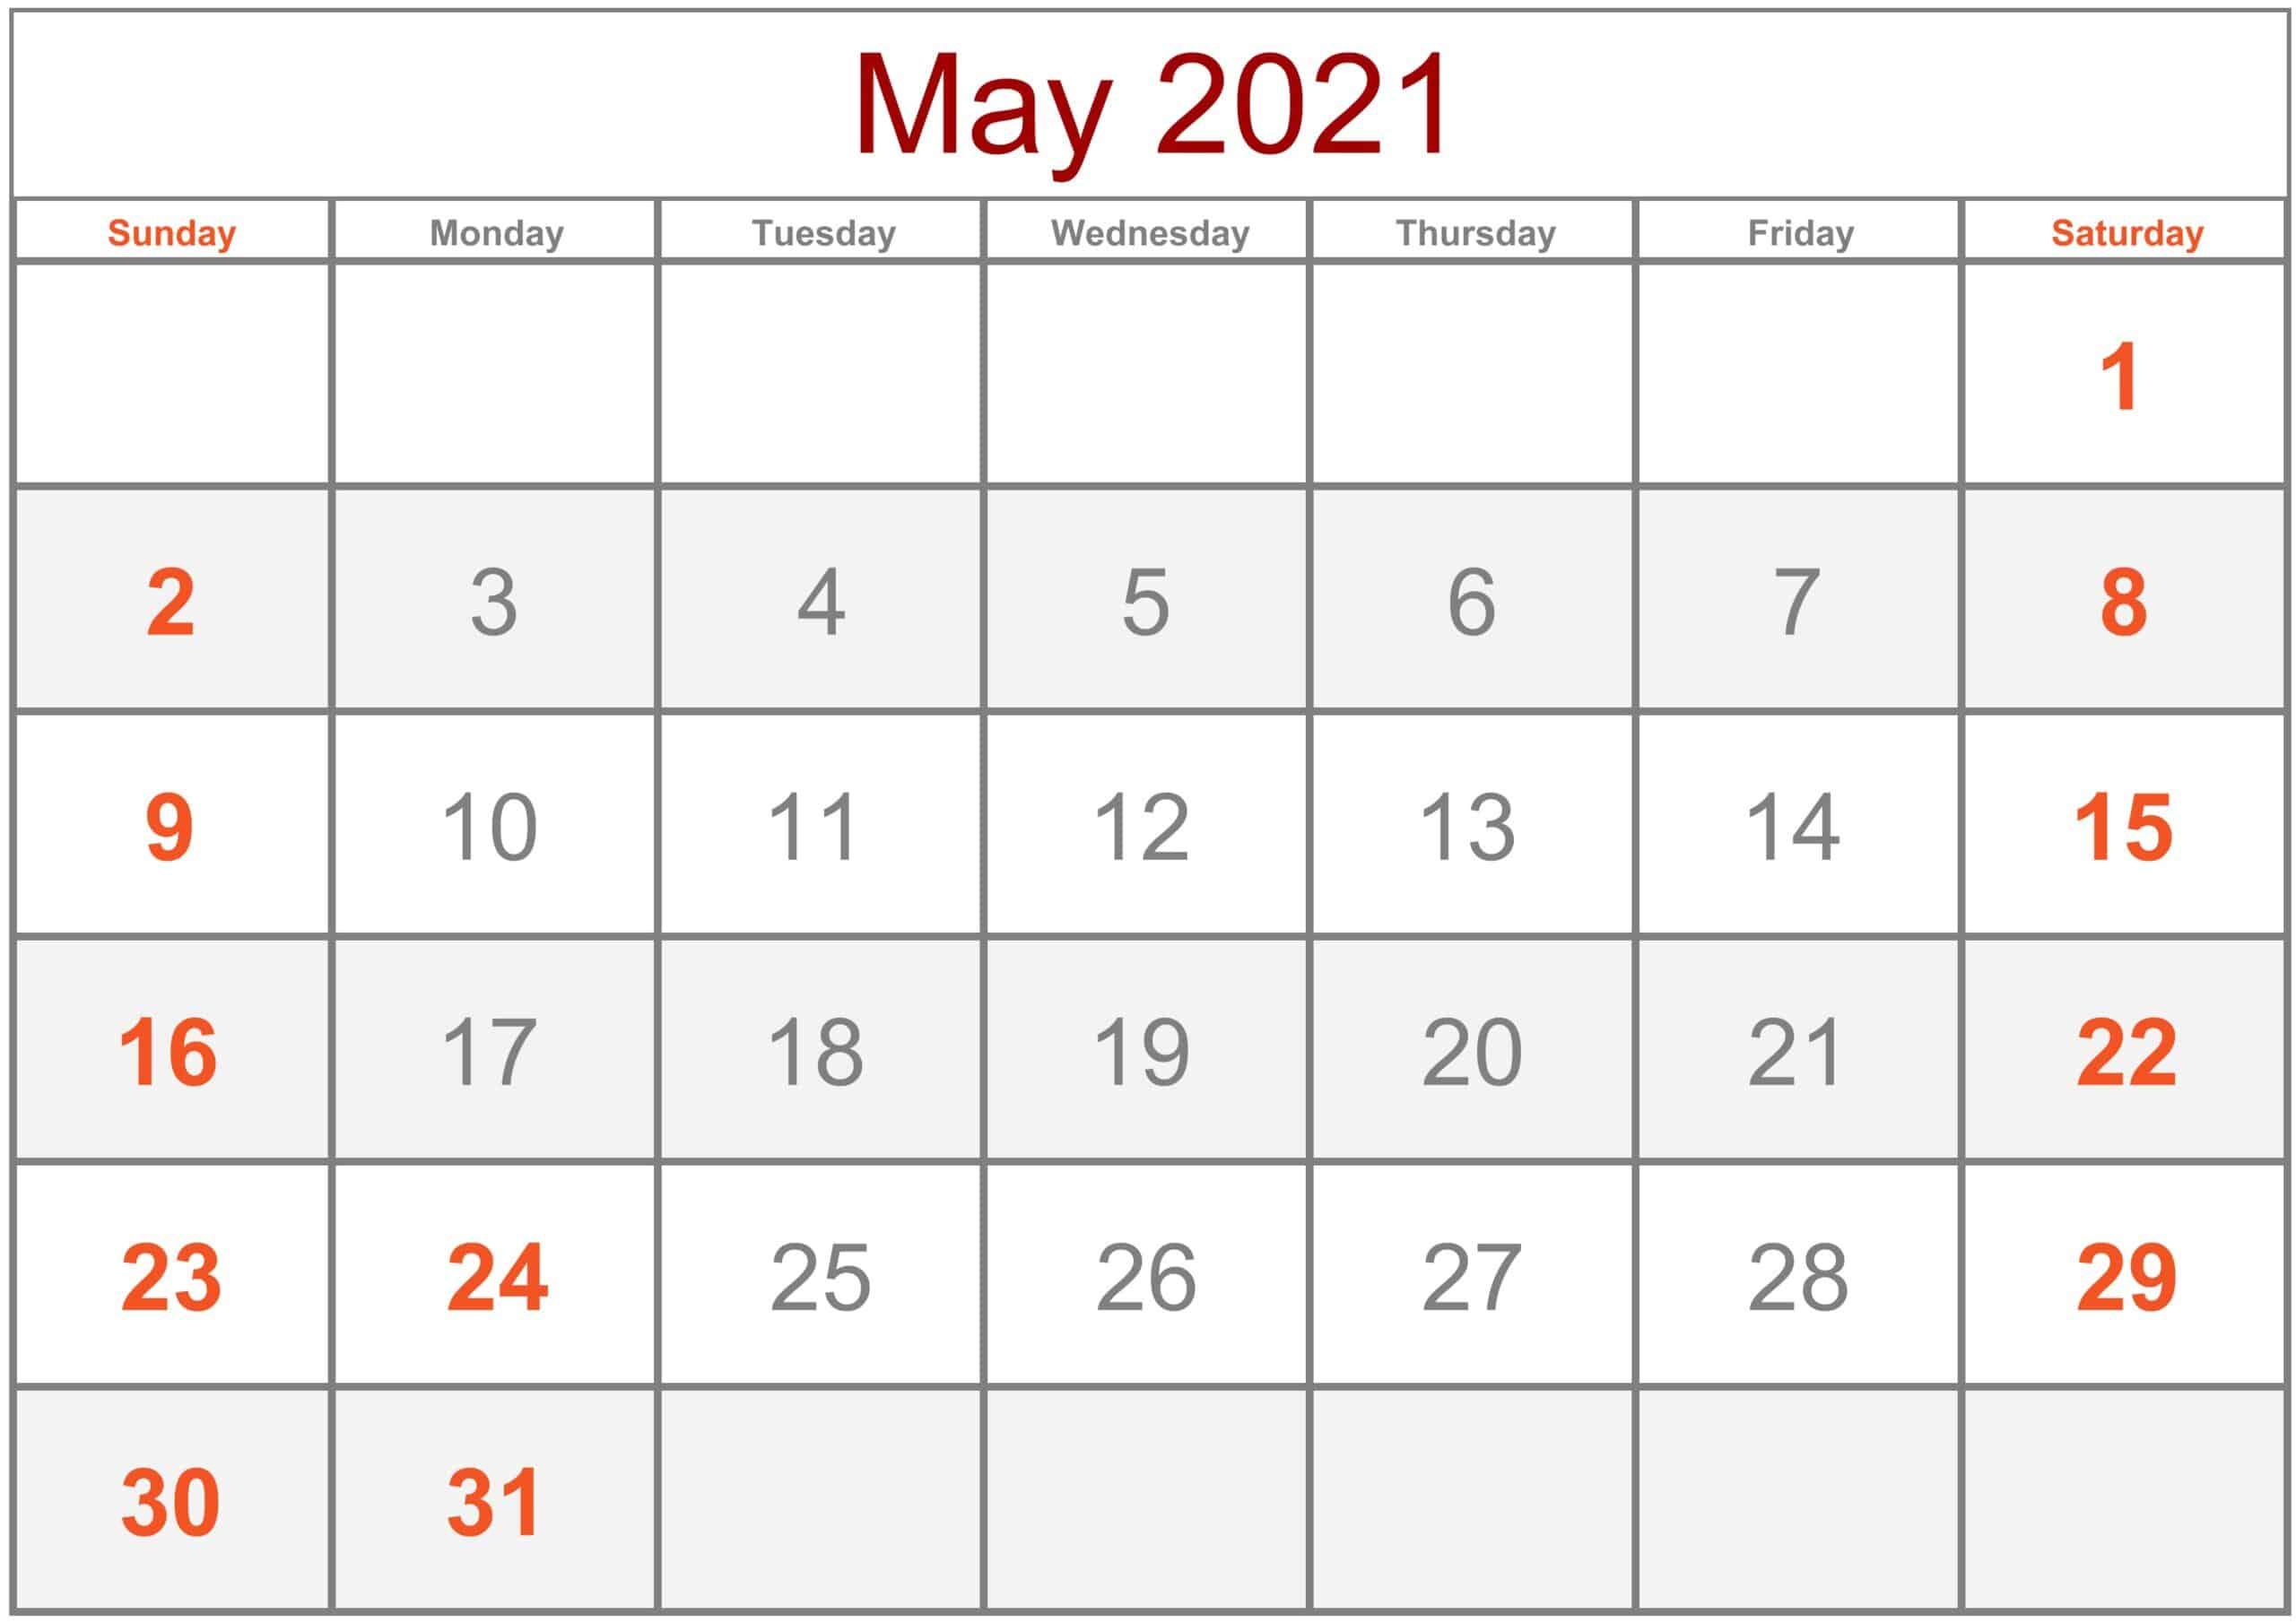 Calendar May 2021 Excel